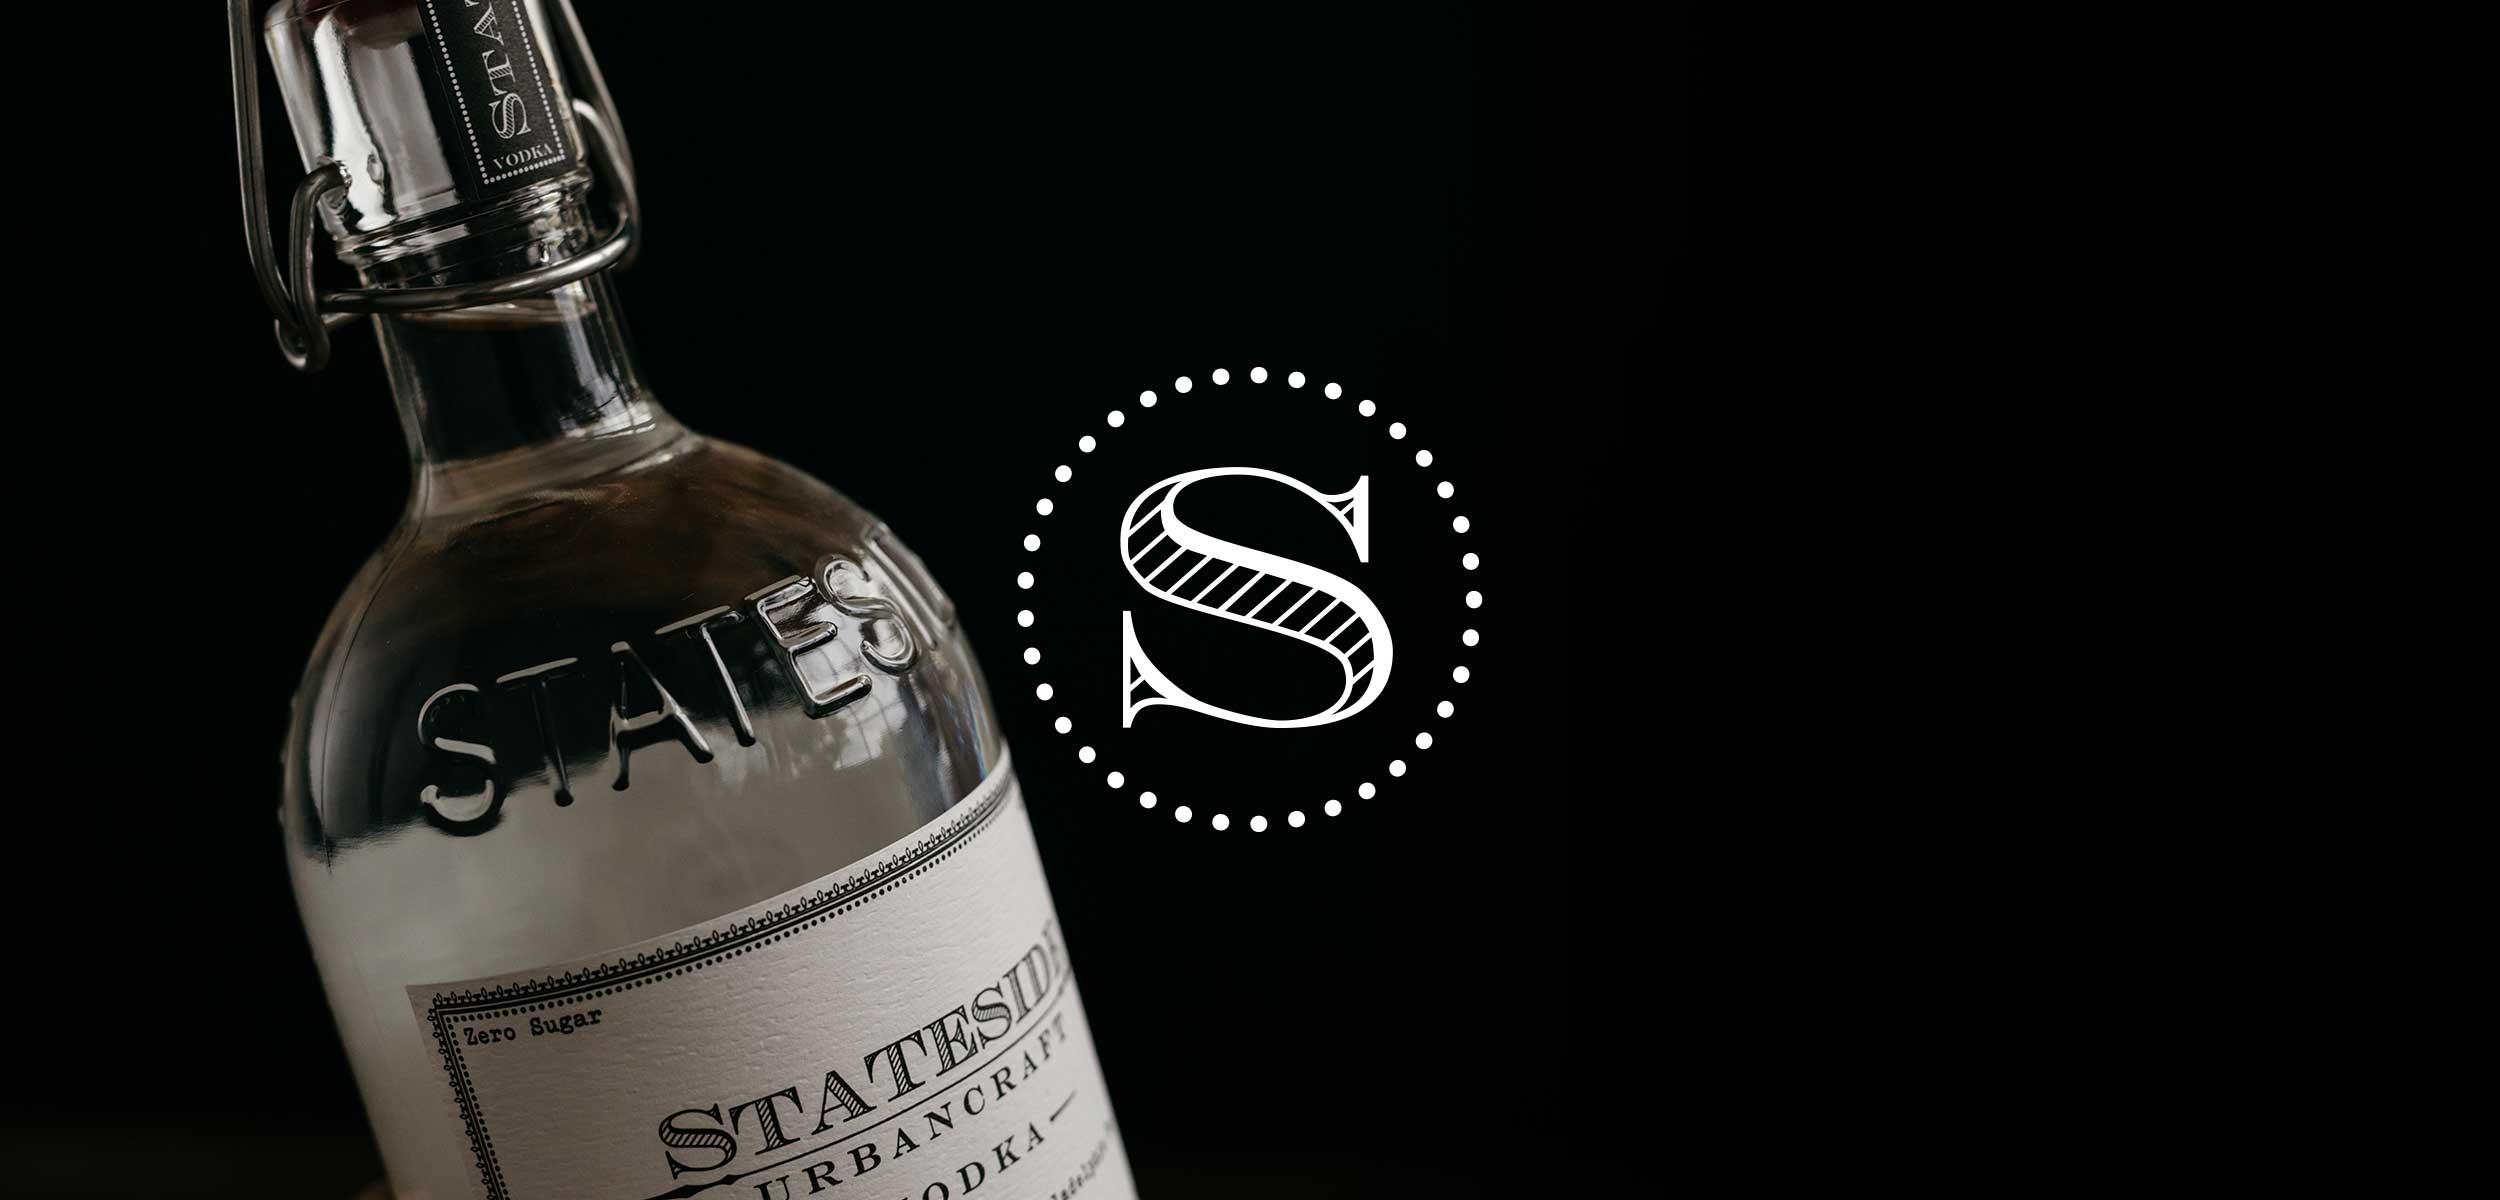 stateside-vodka-slider-b-new